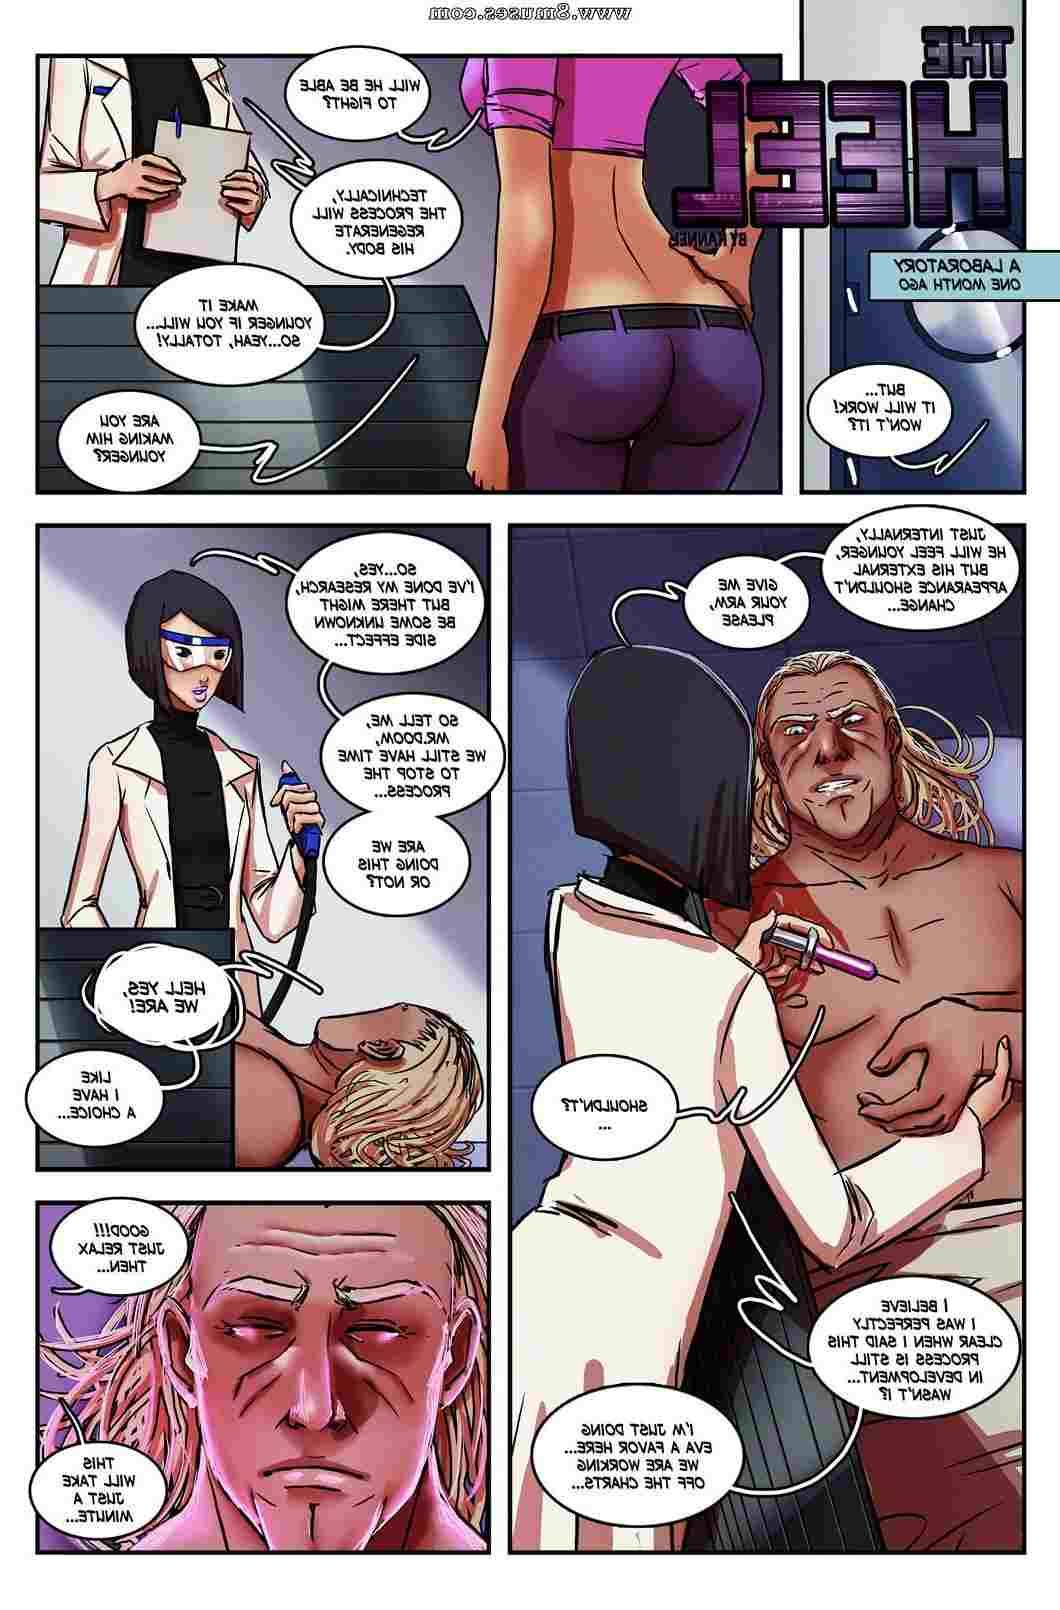 TG-Comics/Kannel/The-Heel The_Heel__8muses_-_Sex_and_Porn_Comics_6.jpg